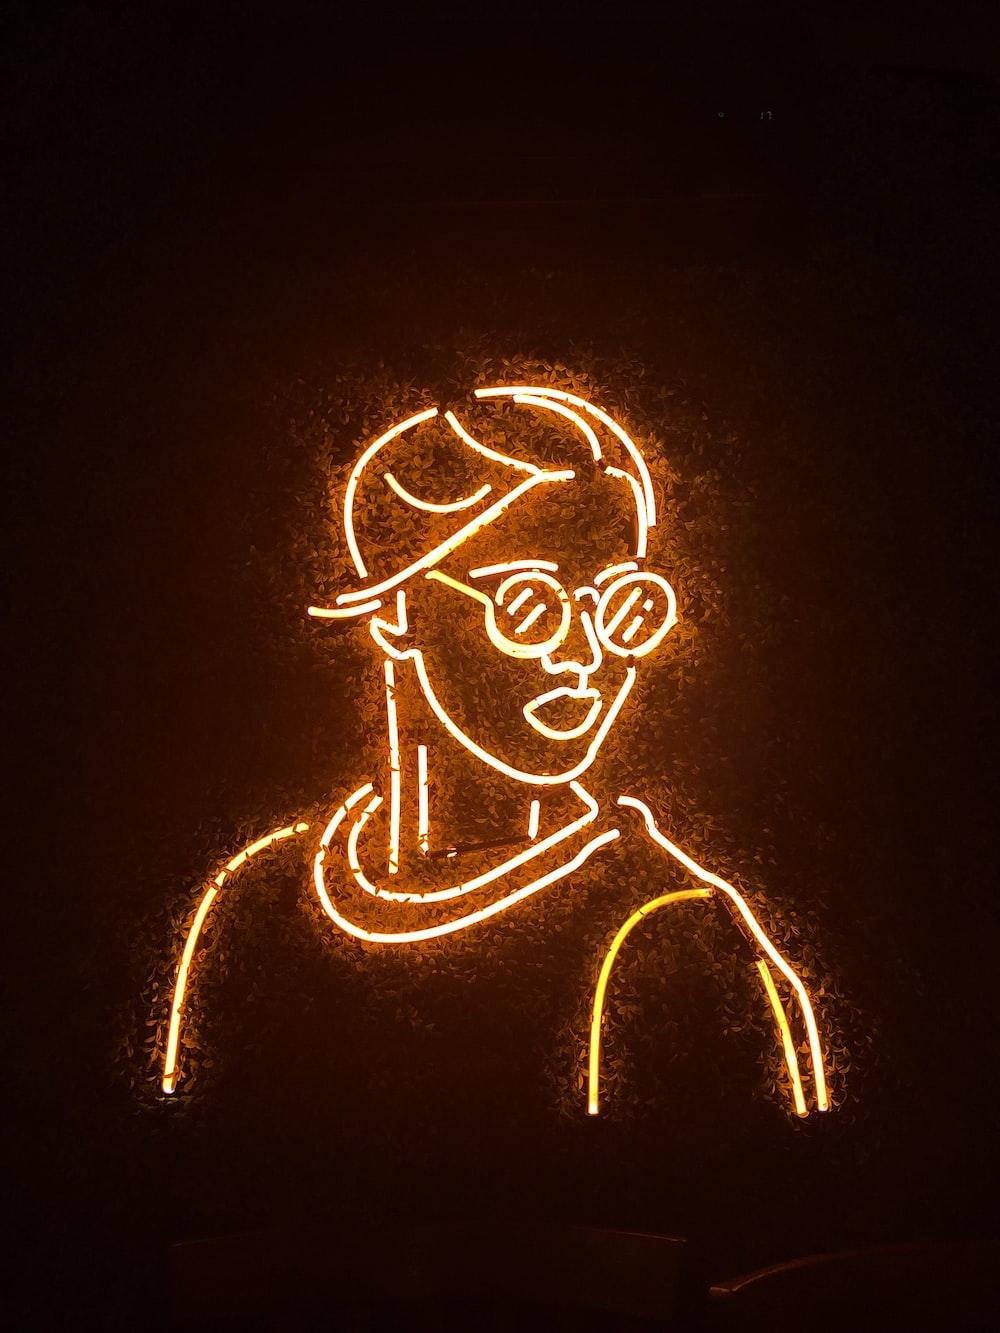 Neon Orange Pictures Download Free Images On Unsplash